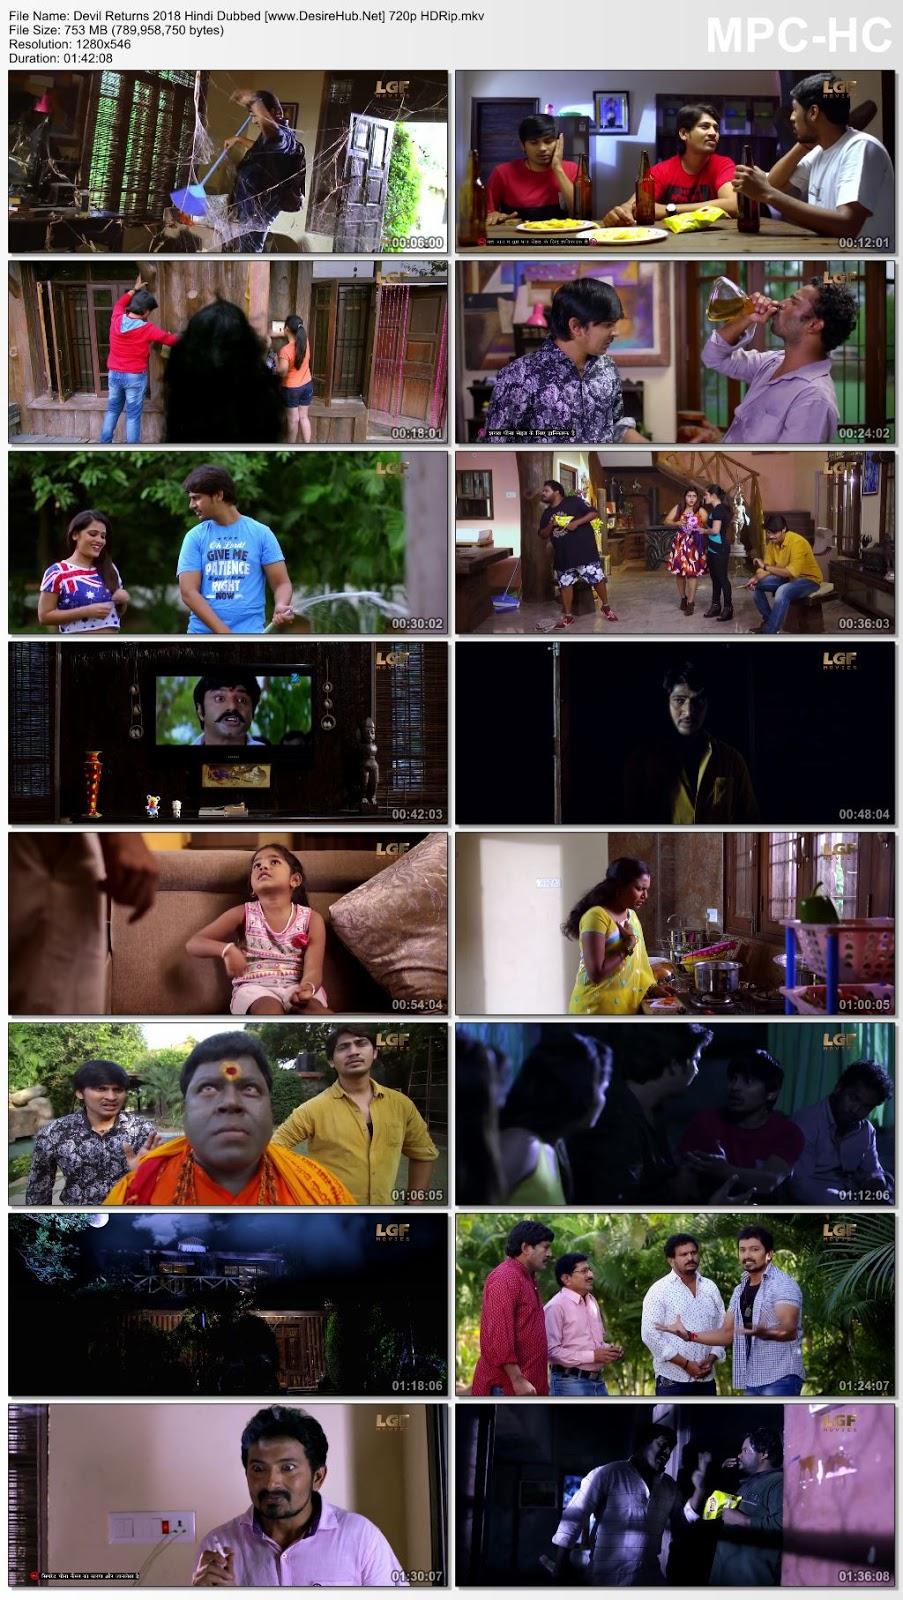 Devil Returns (2018) Hindi Dubbed 720p HDRip 750MB Desirehub